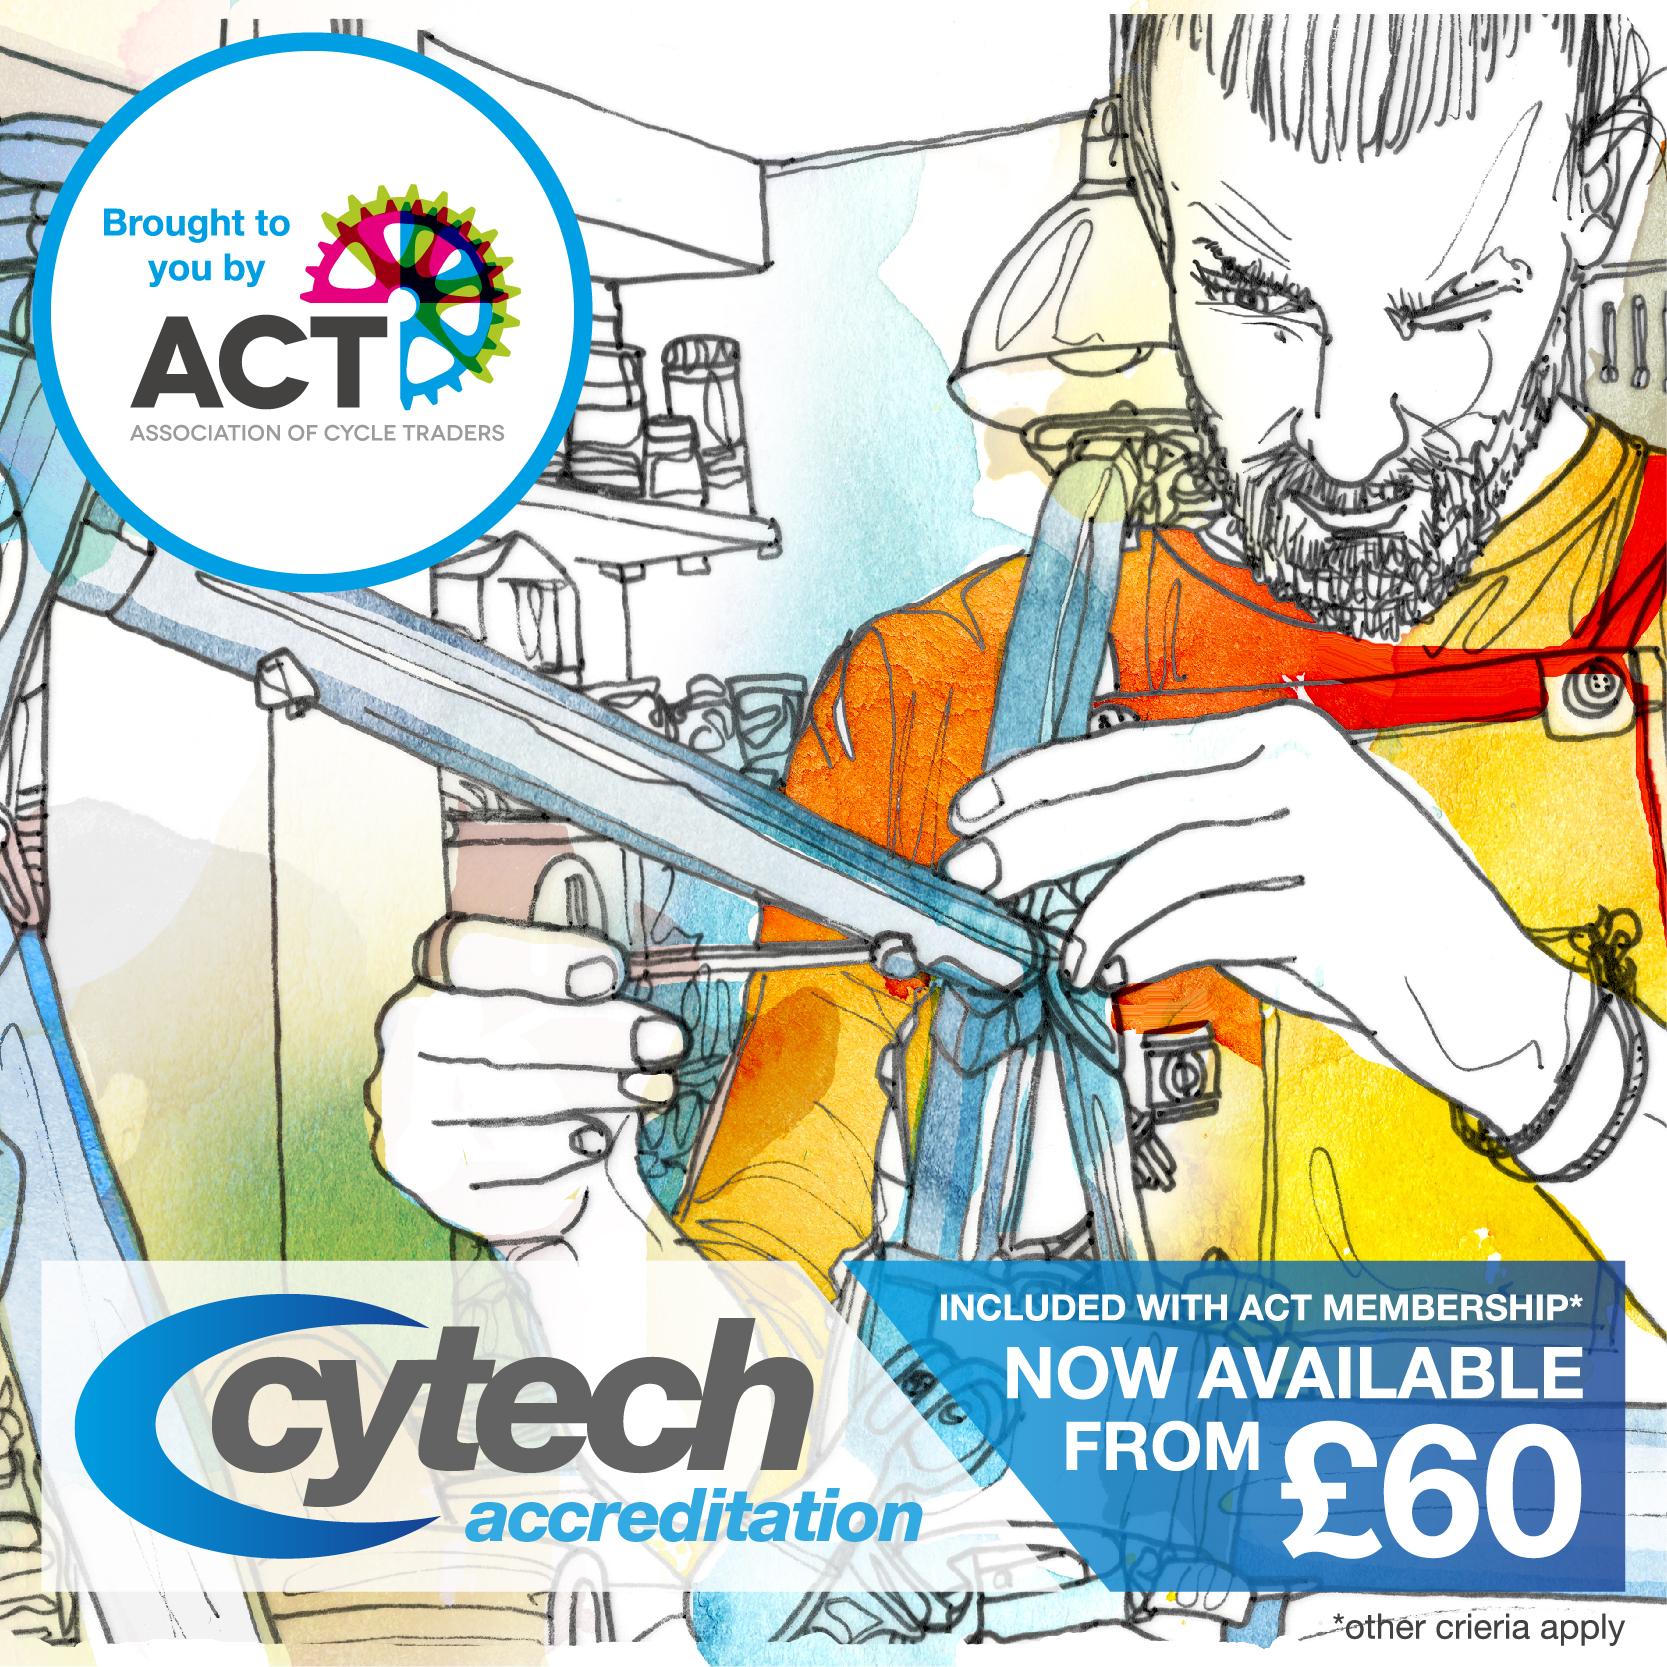 Cytech Accreditation ACT News Graphic